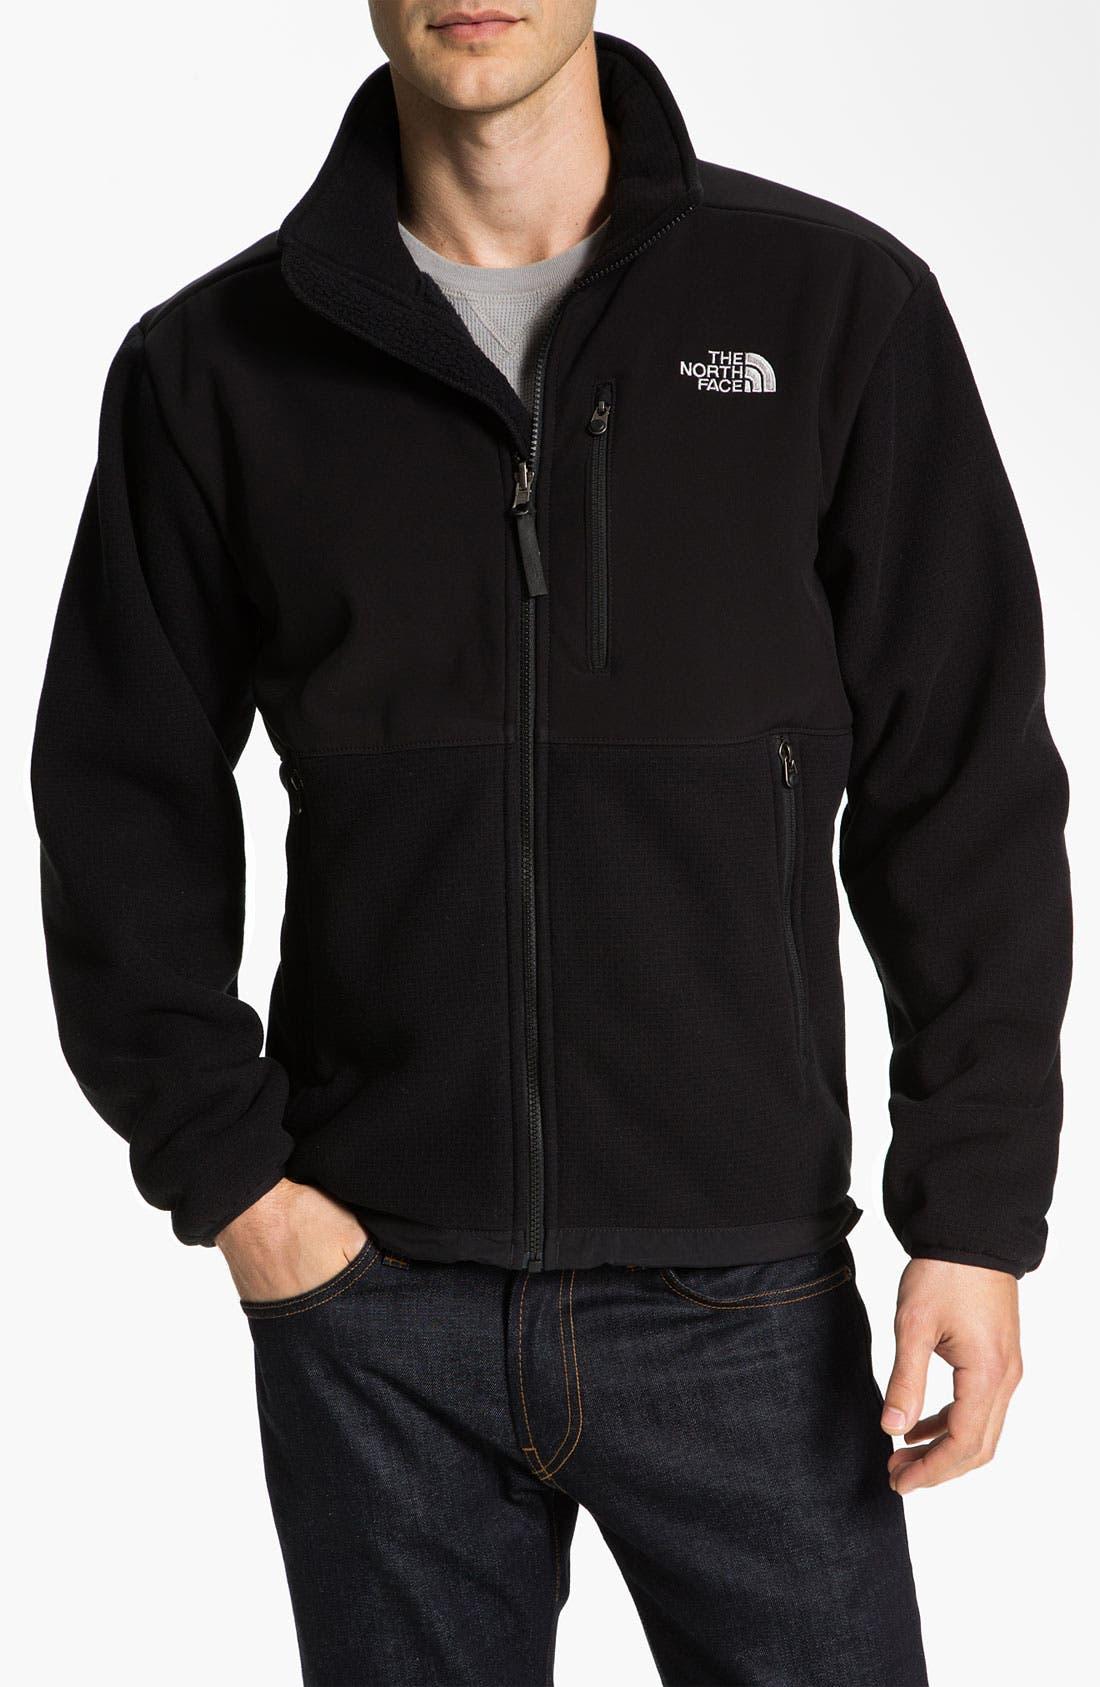 Main Image - The North Face 'Denali' Wind Pro® Jacket